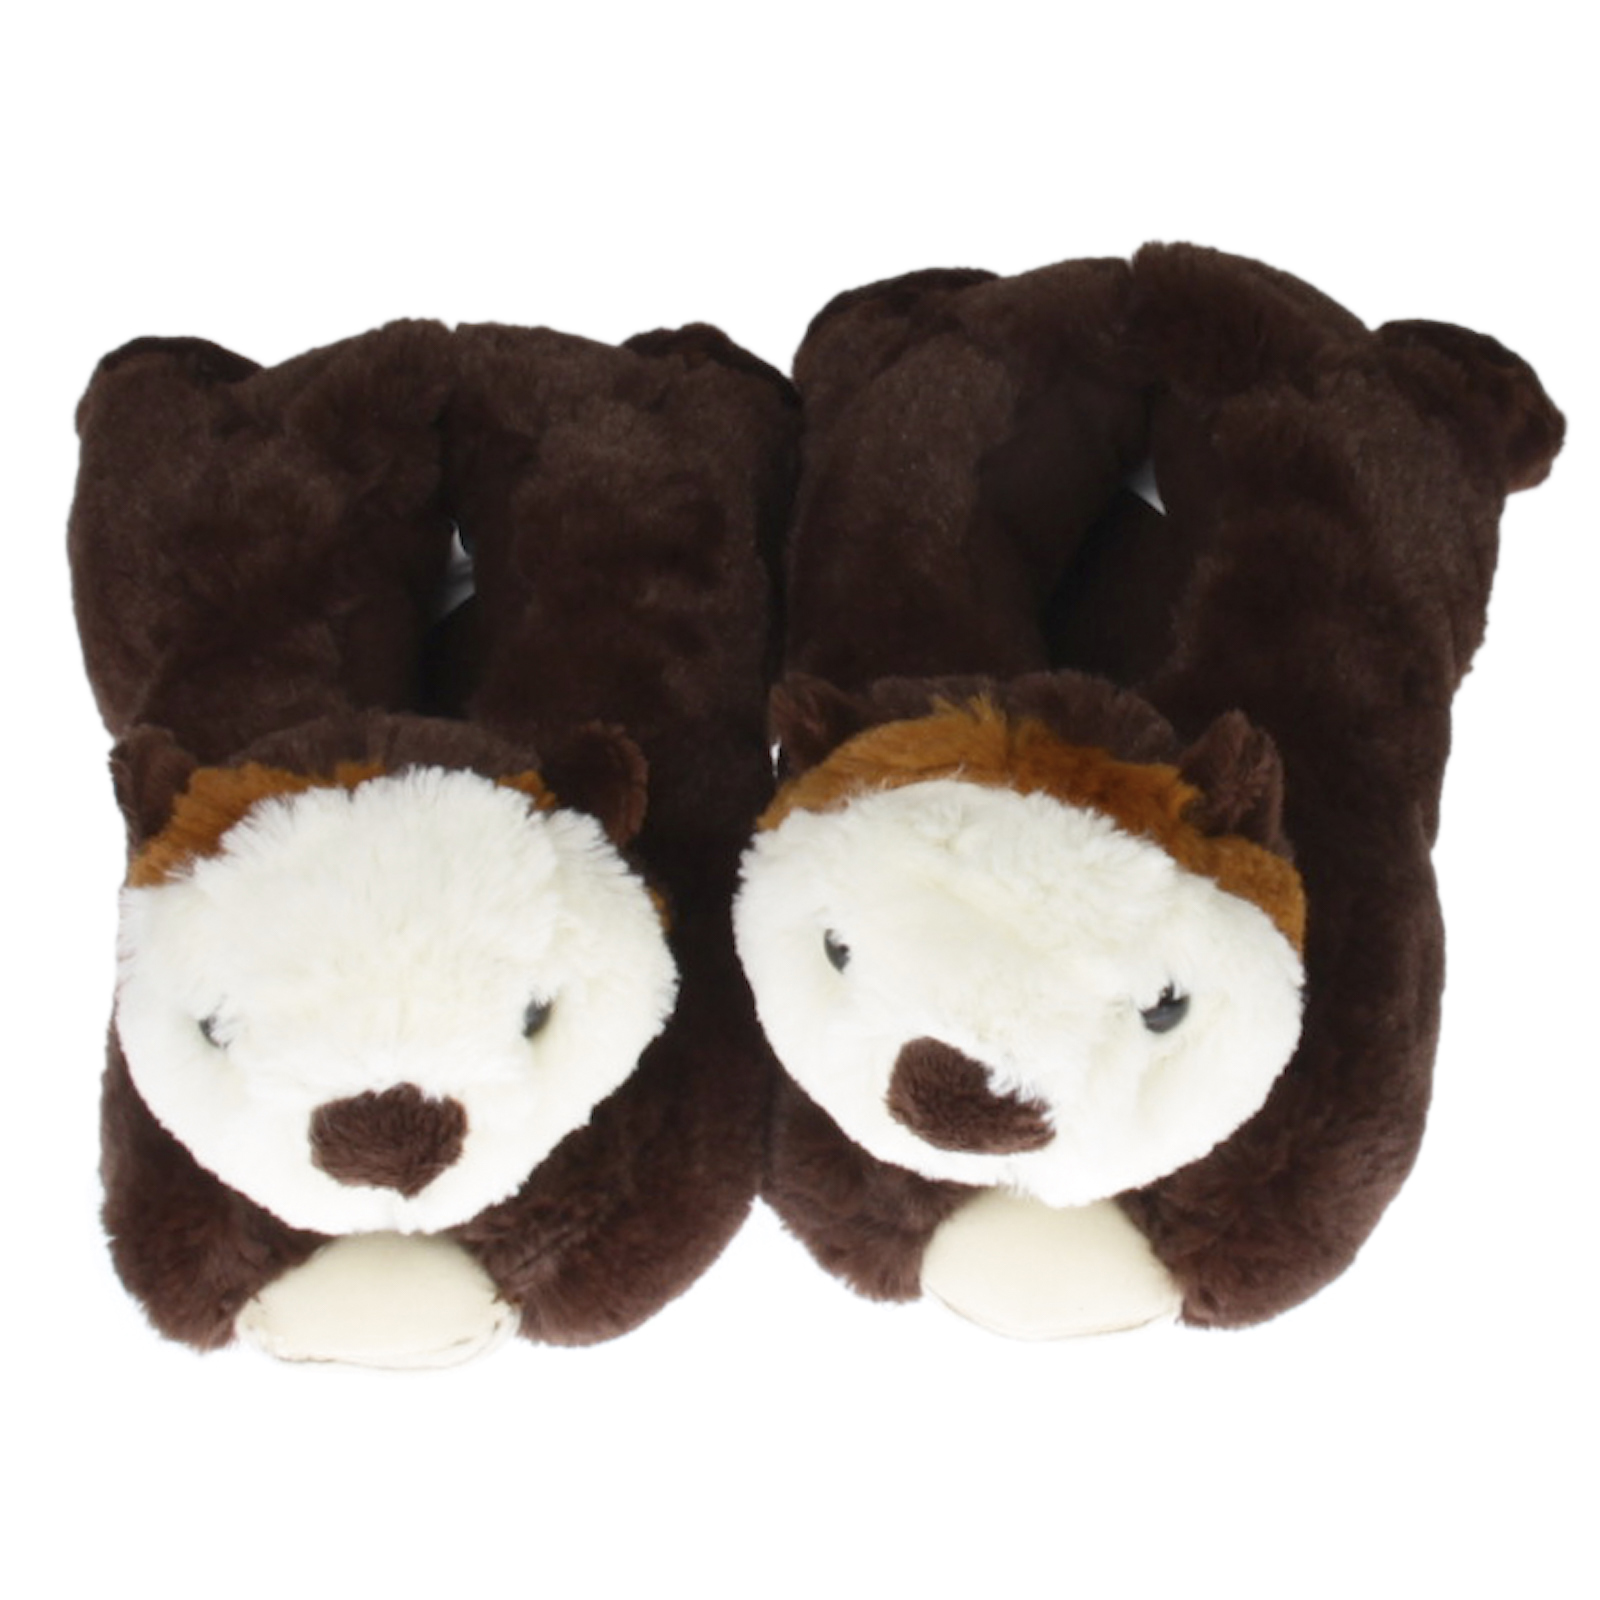 Wishpets Sea Otter Slippers at Sears.com